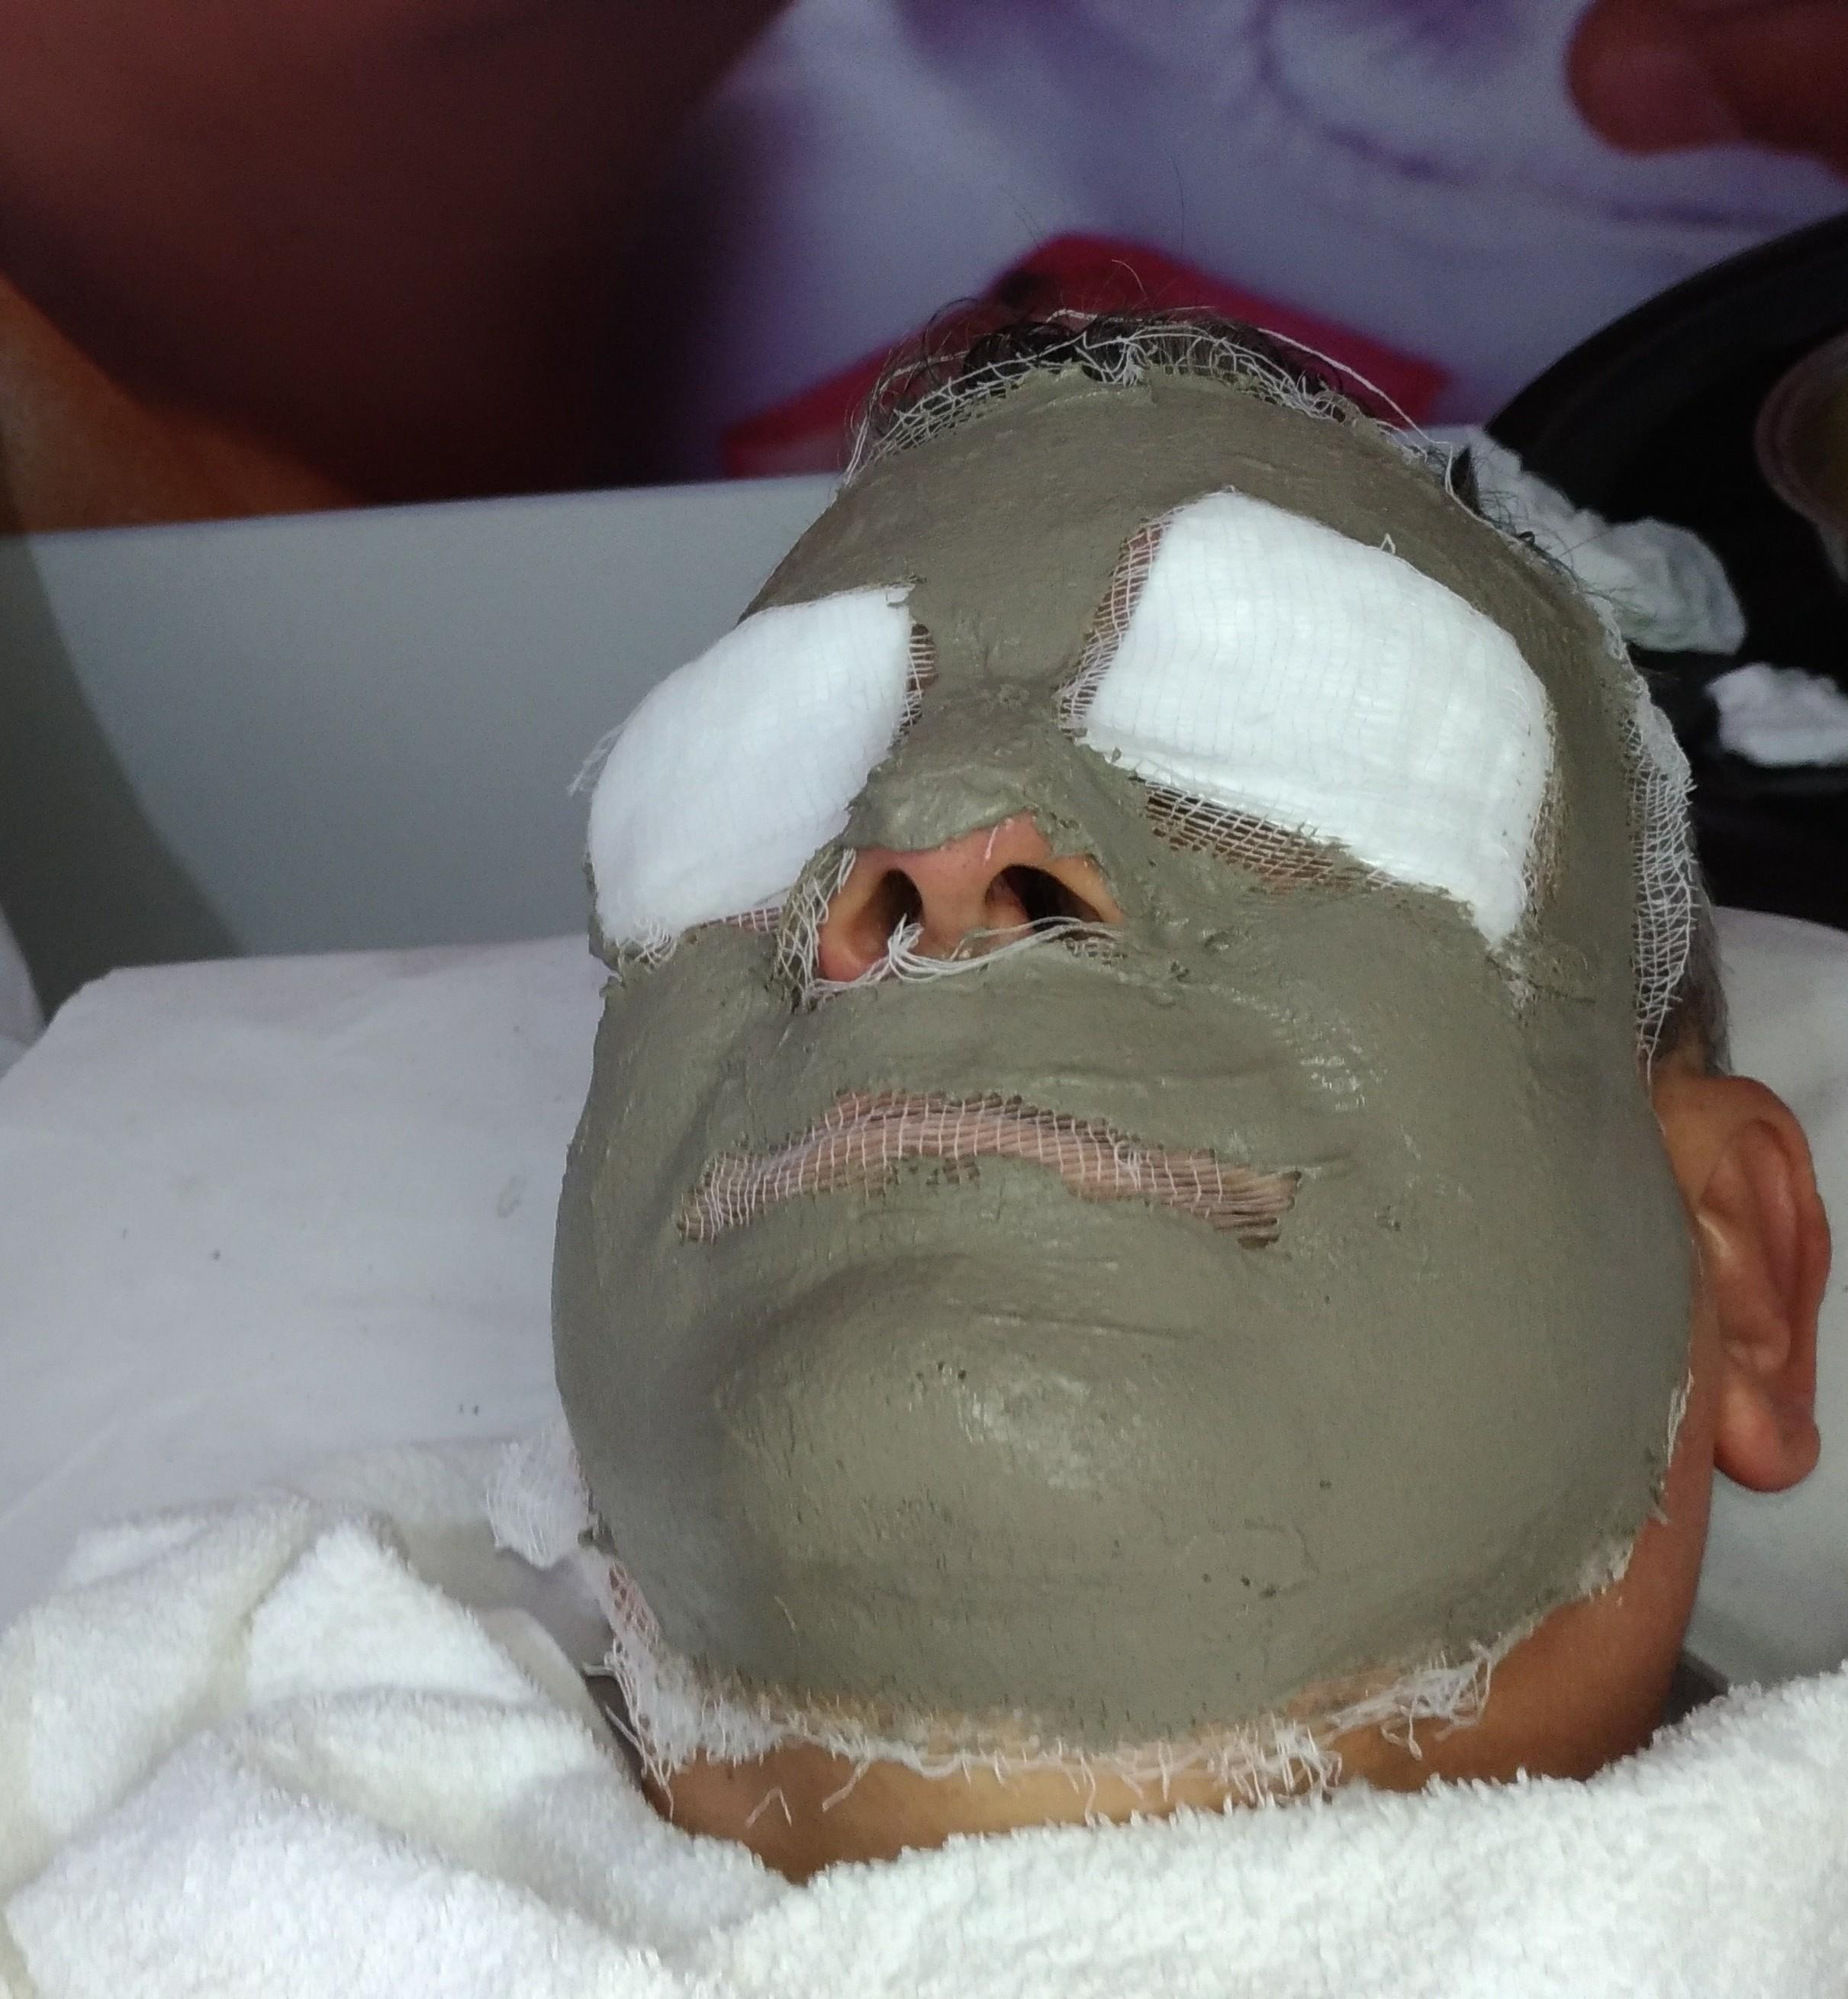 Limpeza de Pele com Máscara Detox! estética esteticista massoterapeuta designer de sobrancelhas